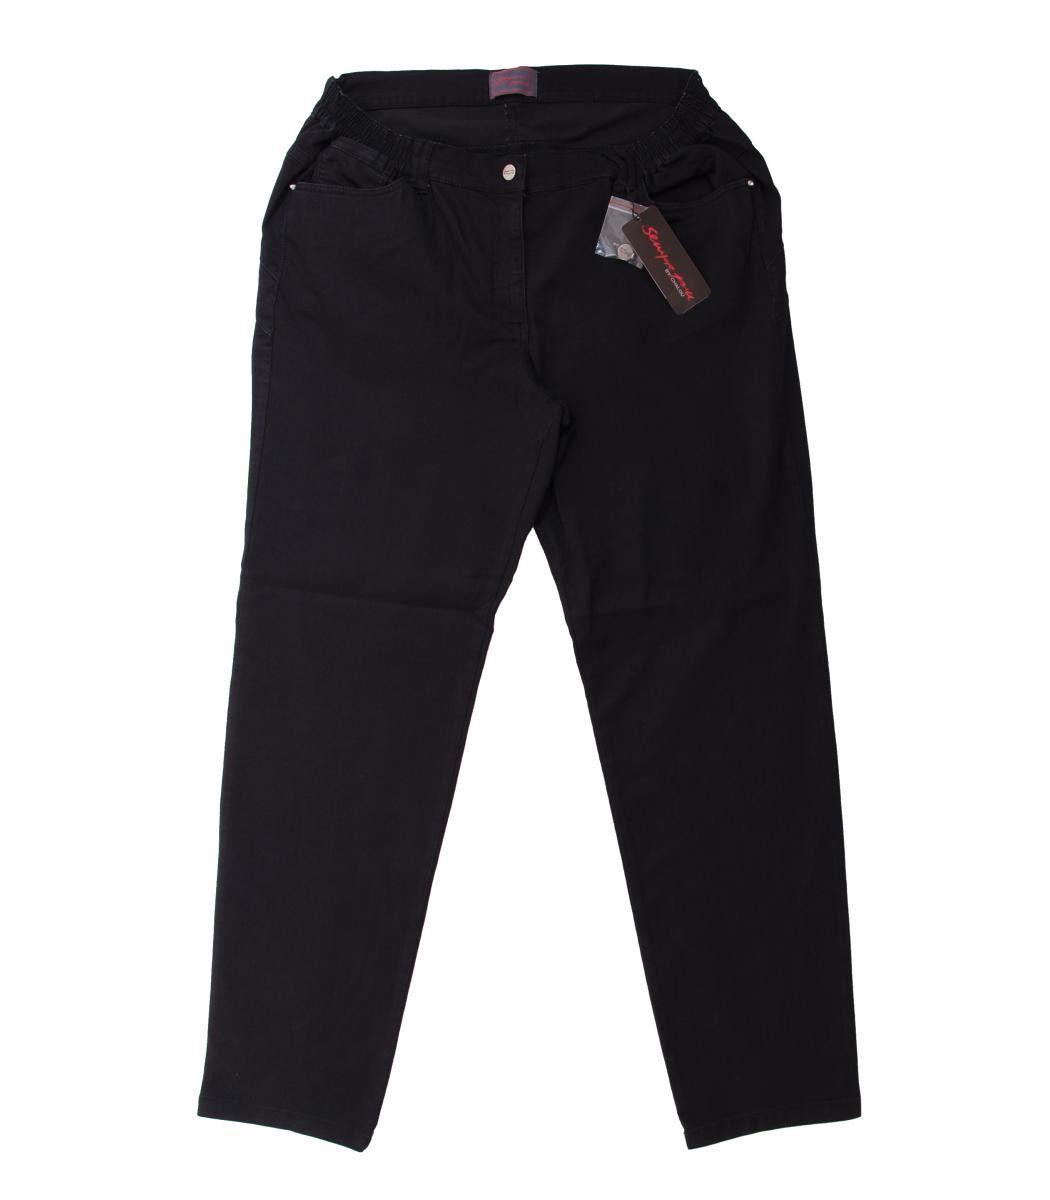 Sempre Piu by Chalou Damen Jeans Hose große Größen Schwarz ... 4ba25d60bc